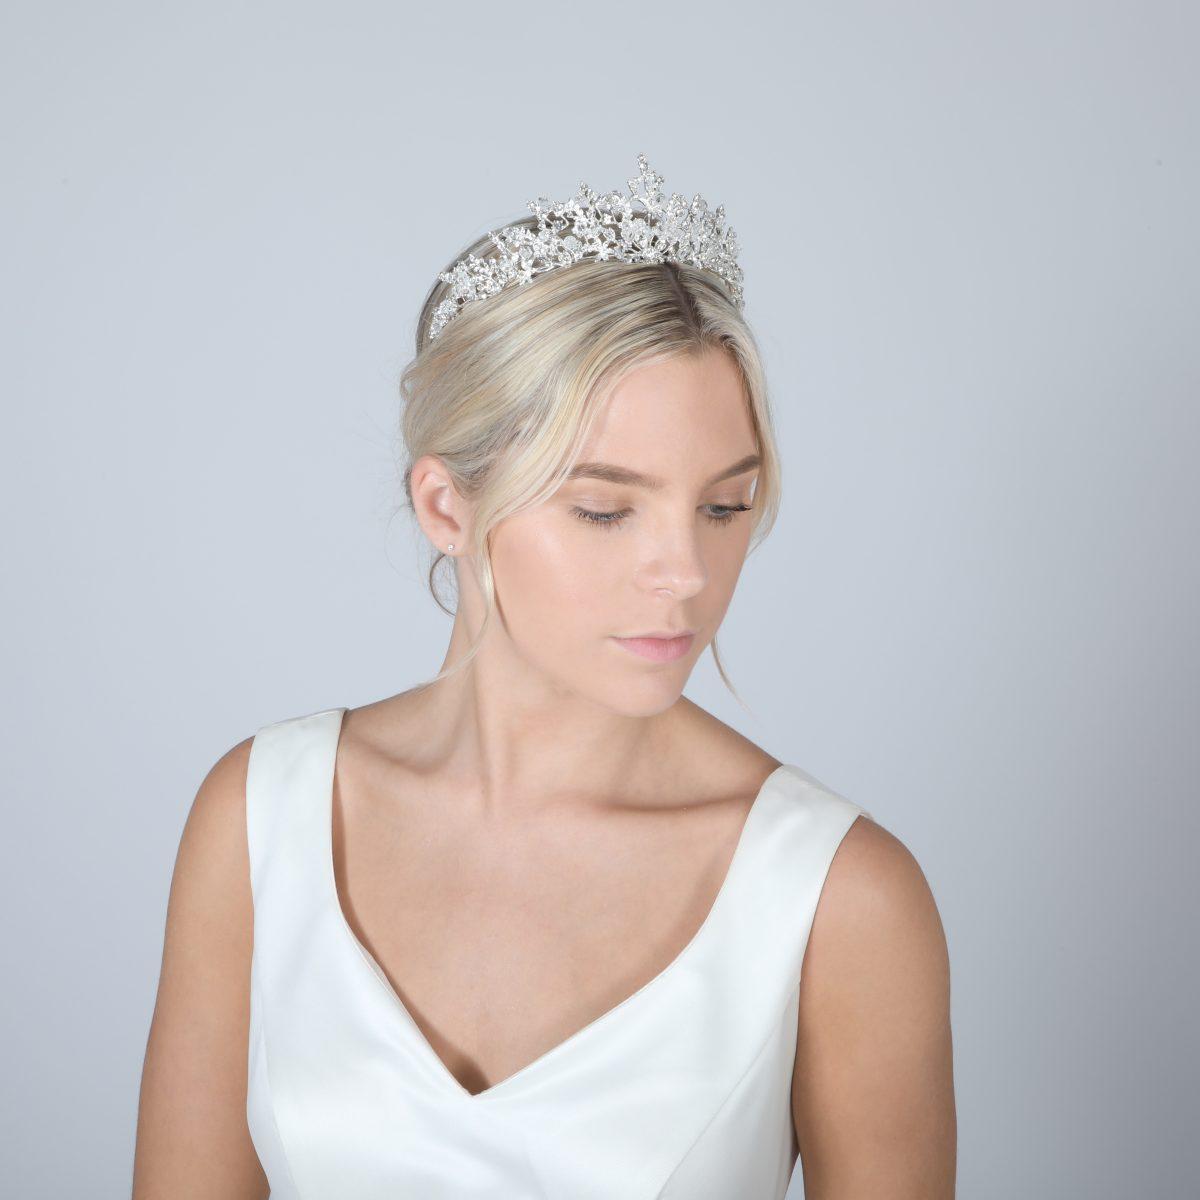 Perfect Bridal Tiara - PBT5027 1